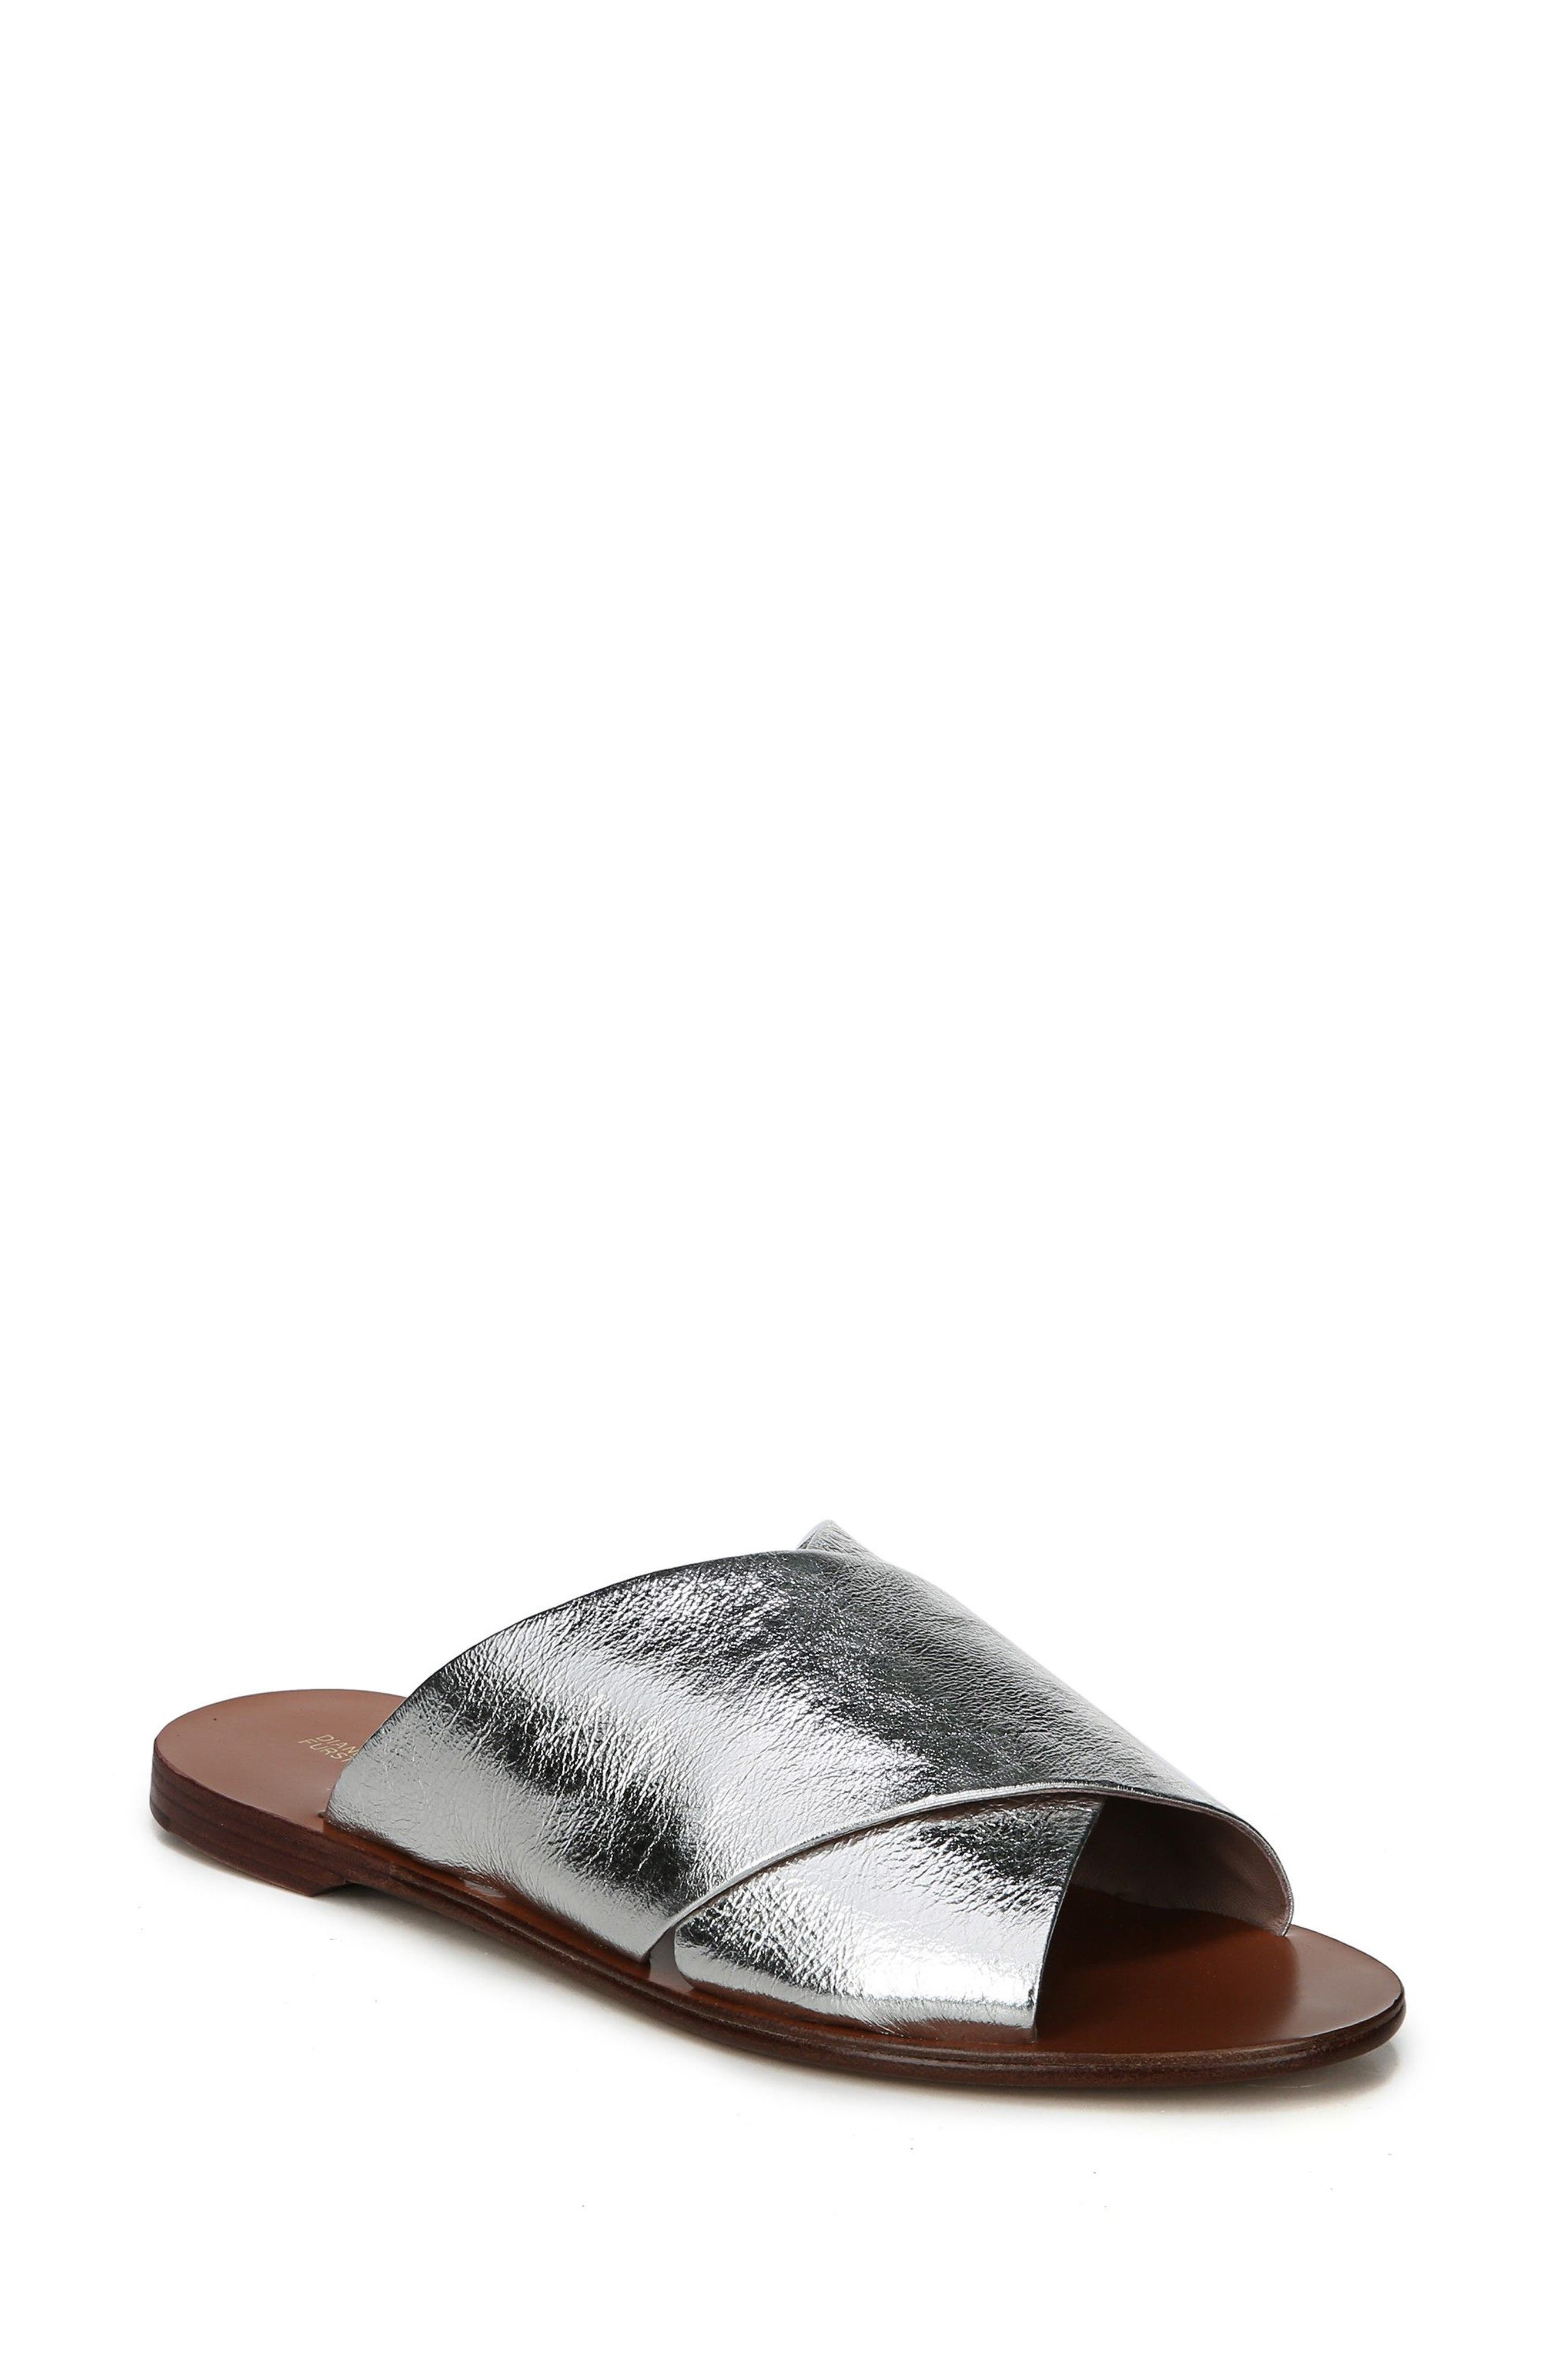 Bailie Sandal,                             Main thumbnail 1, color,                             Silver Leather